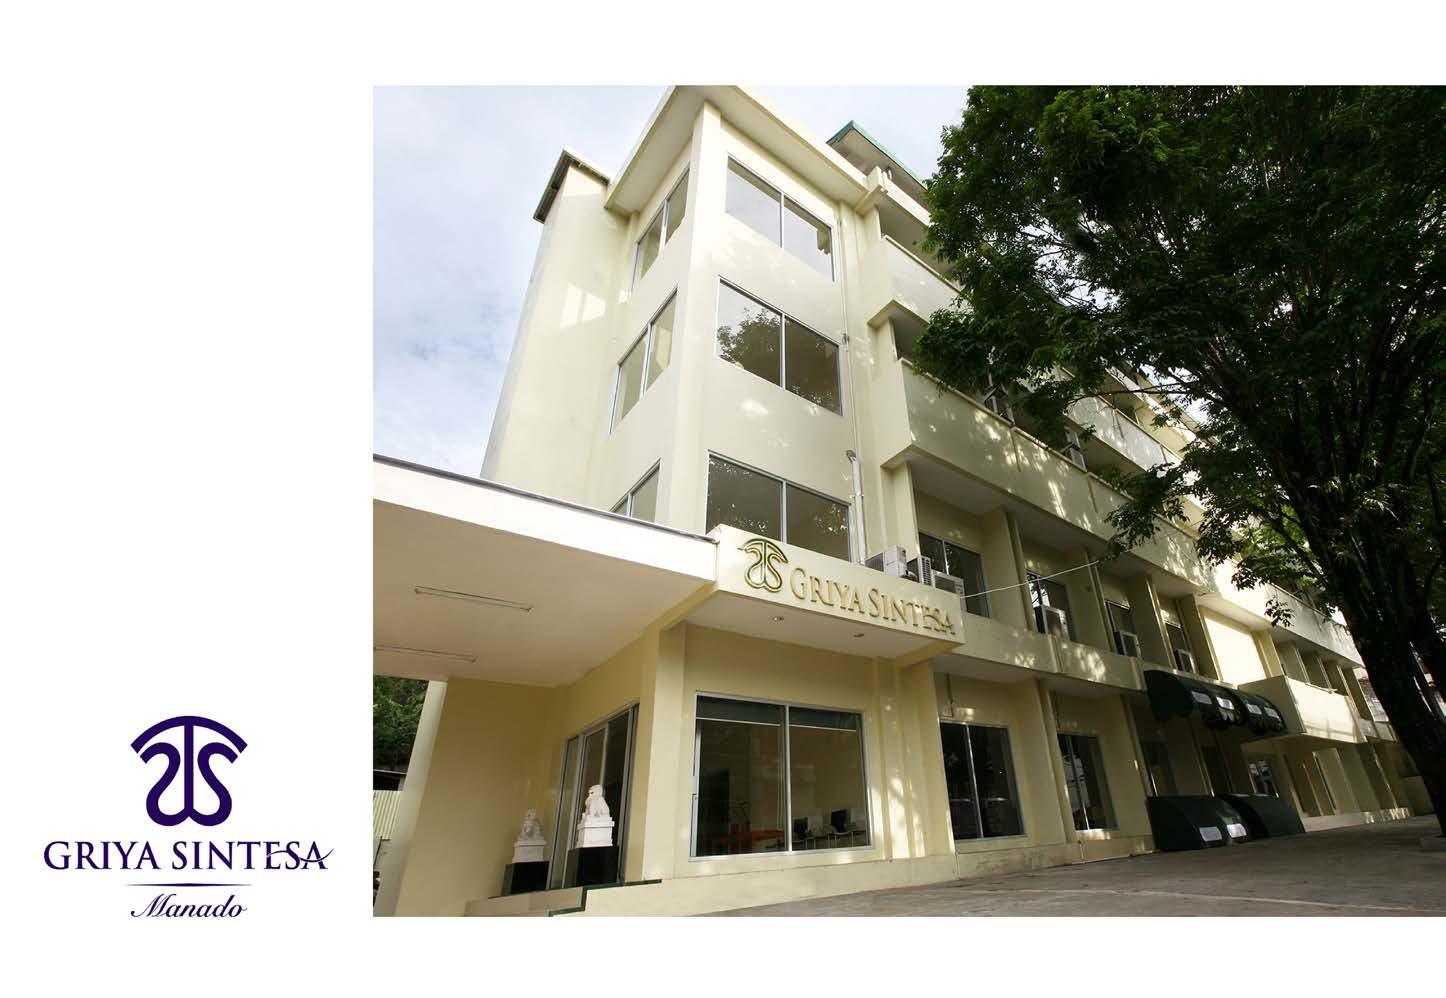 sintesa-hotel26